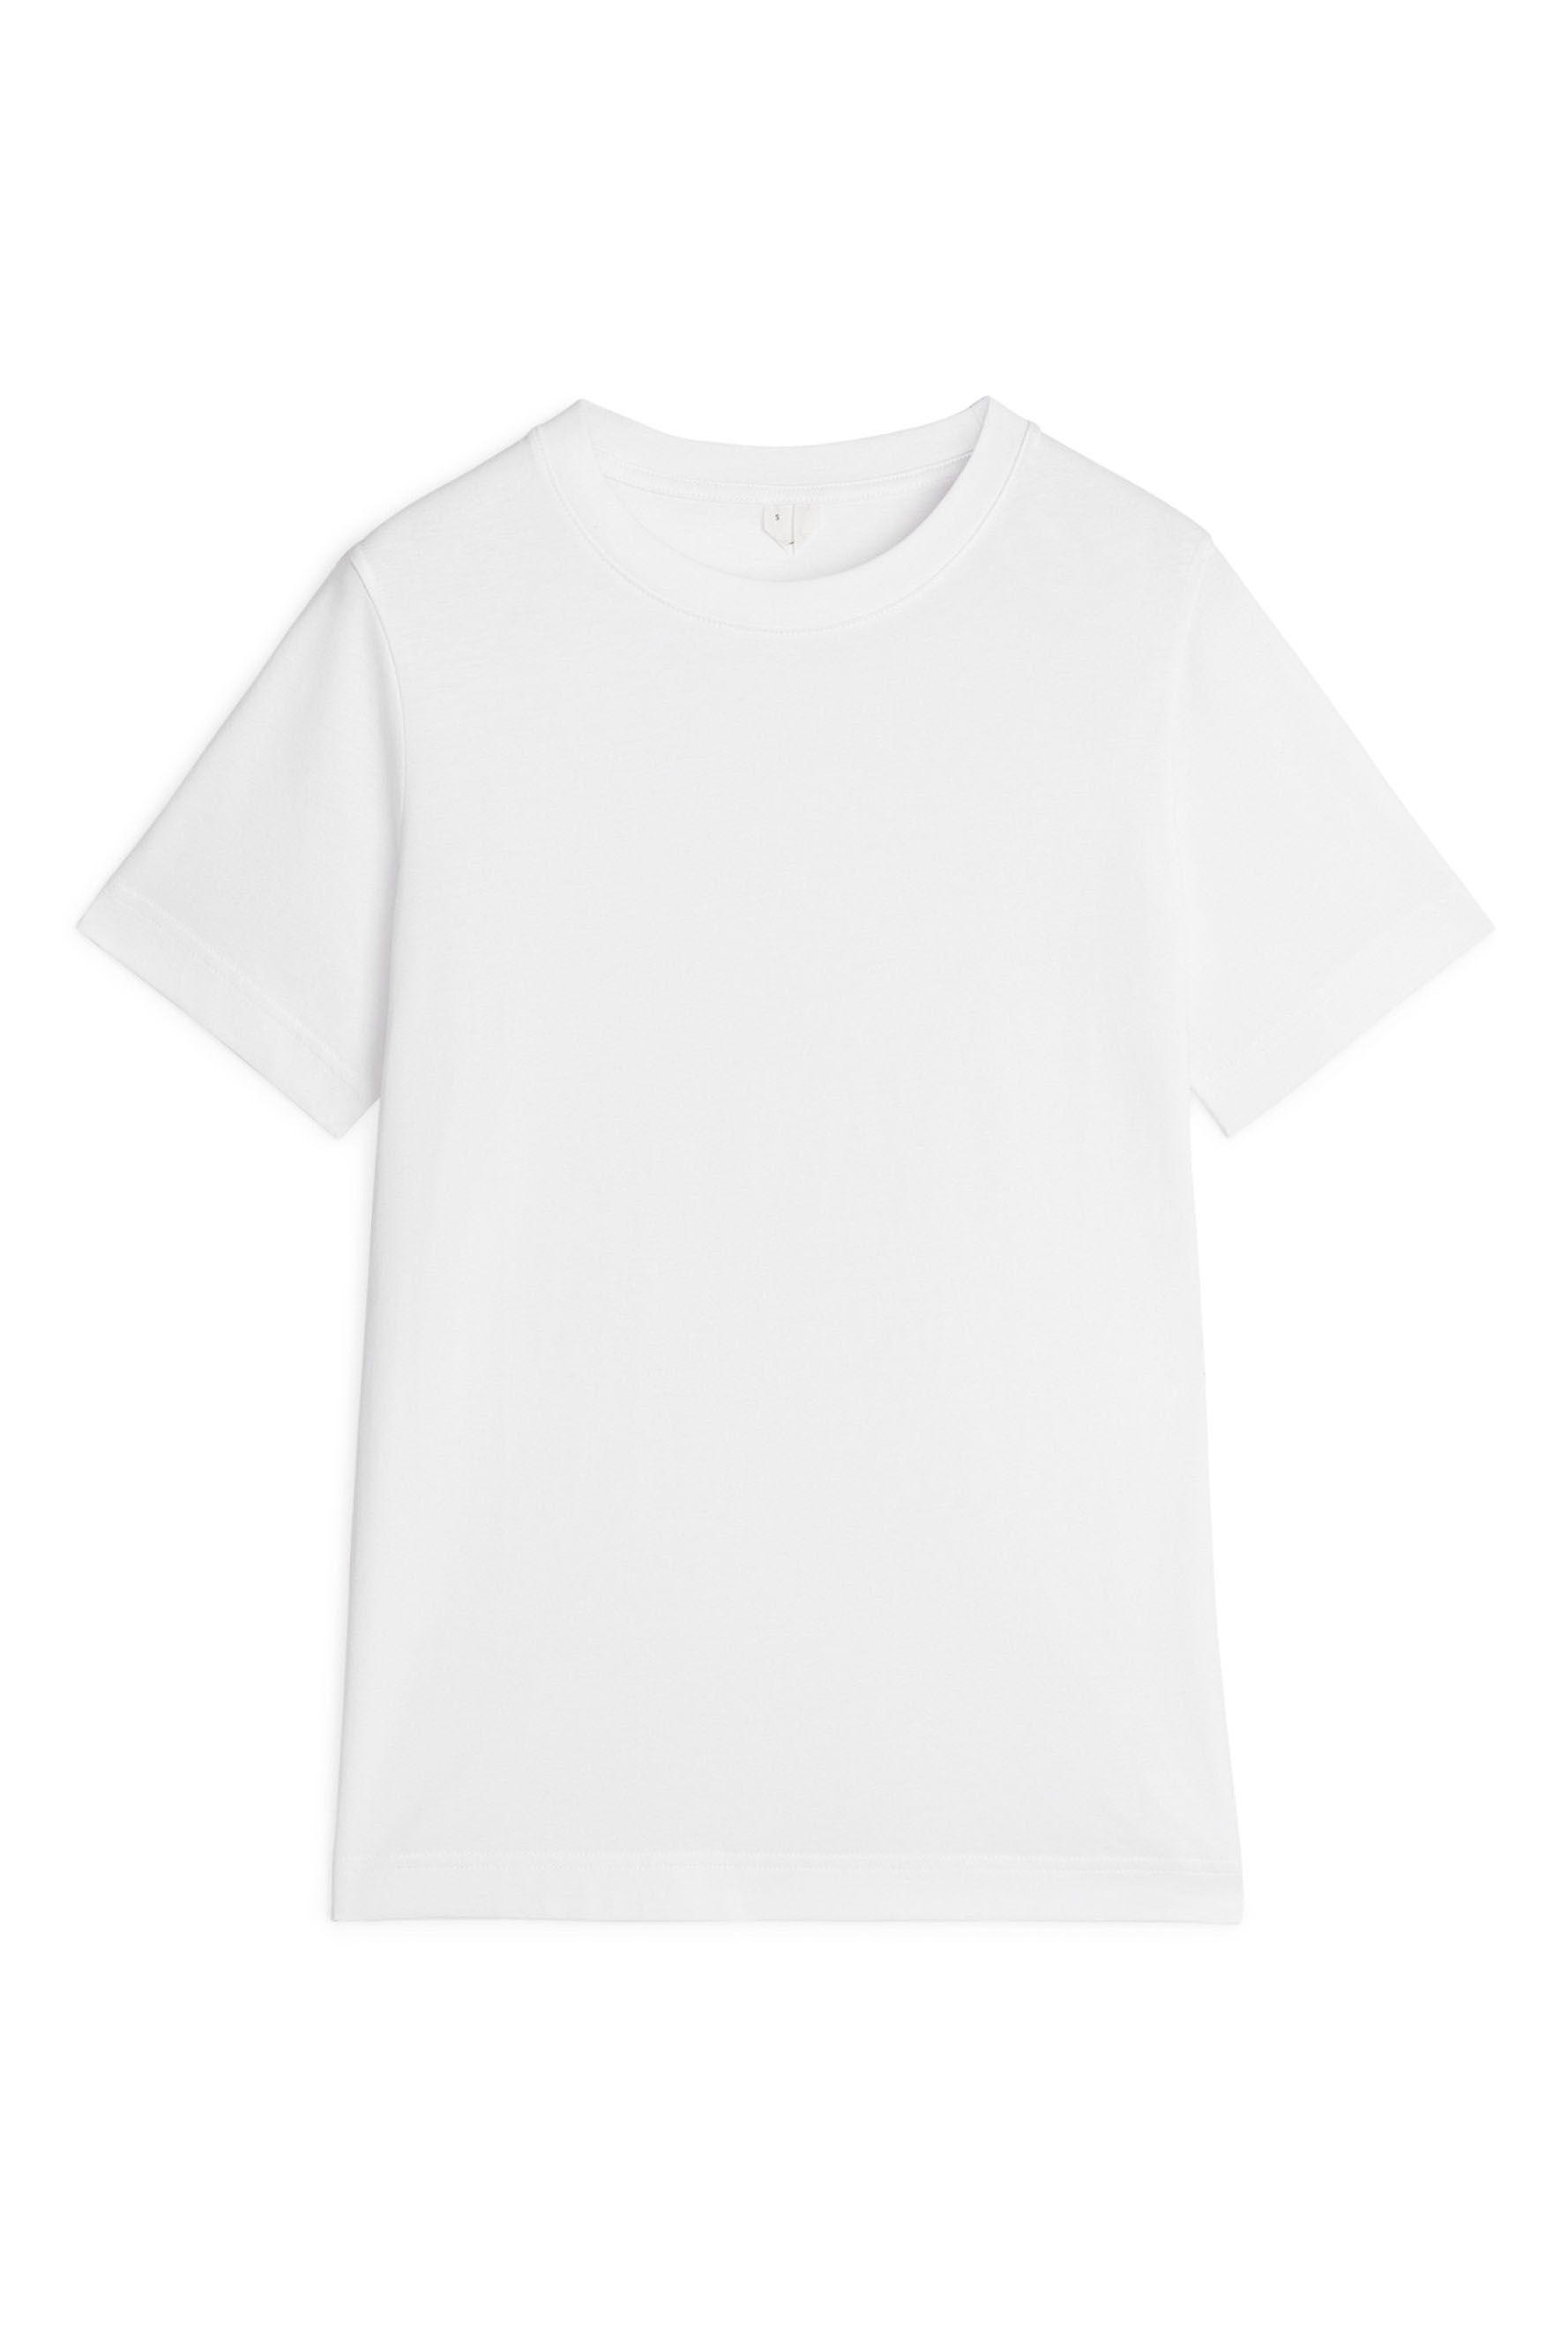 Arket white T shirt